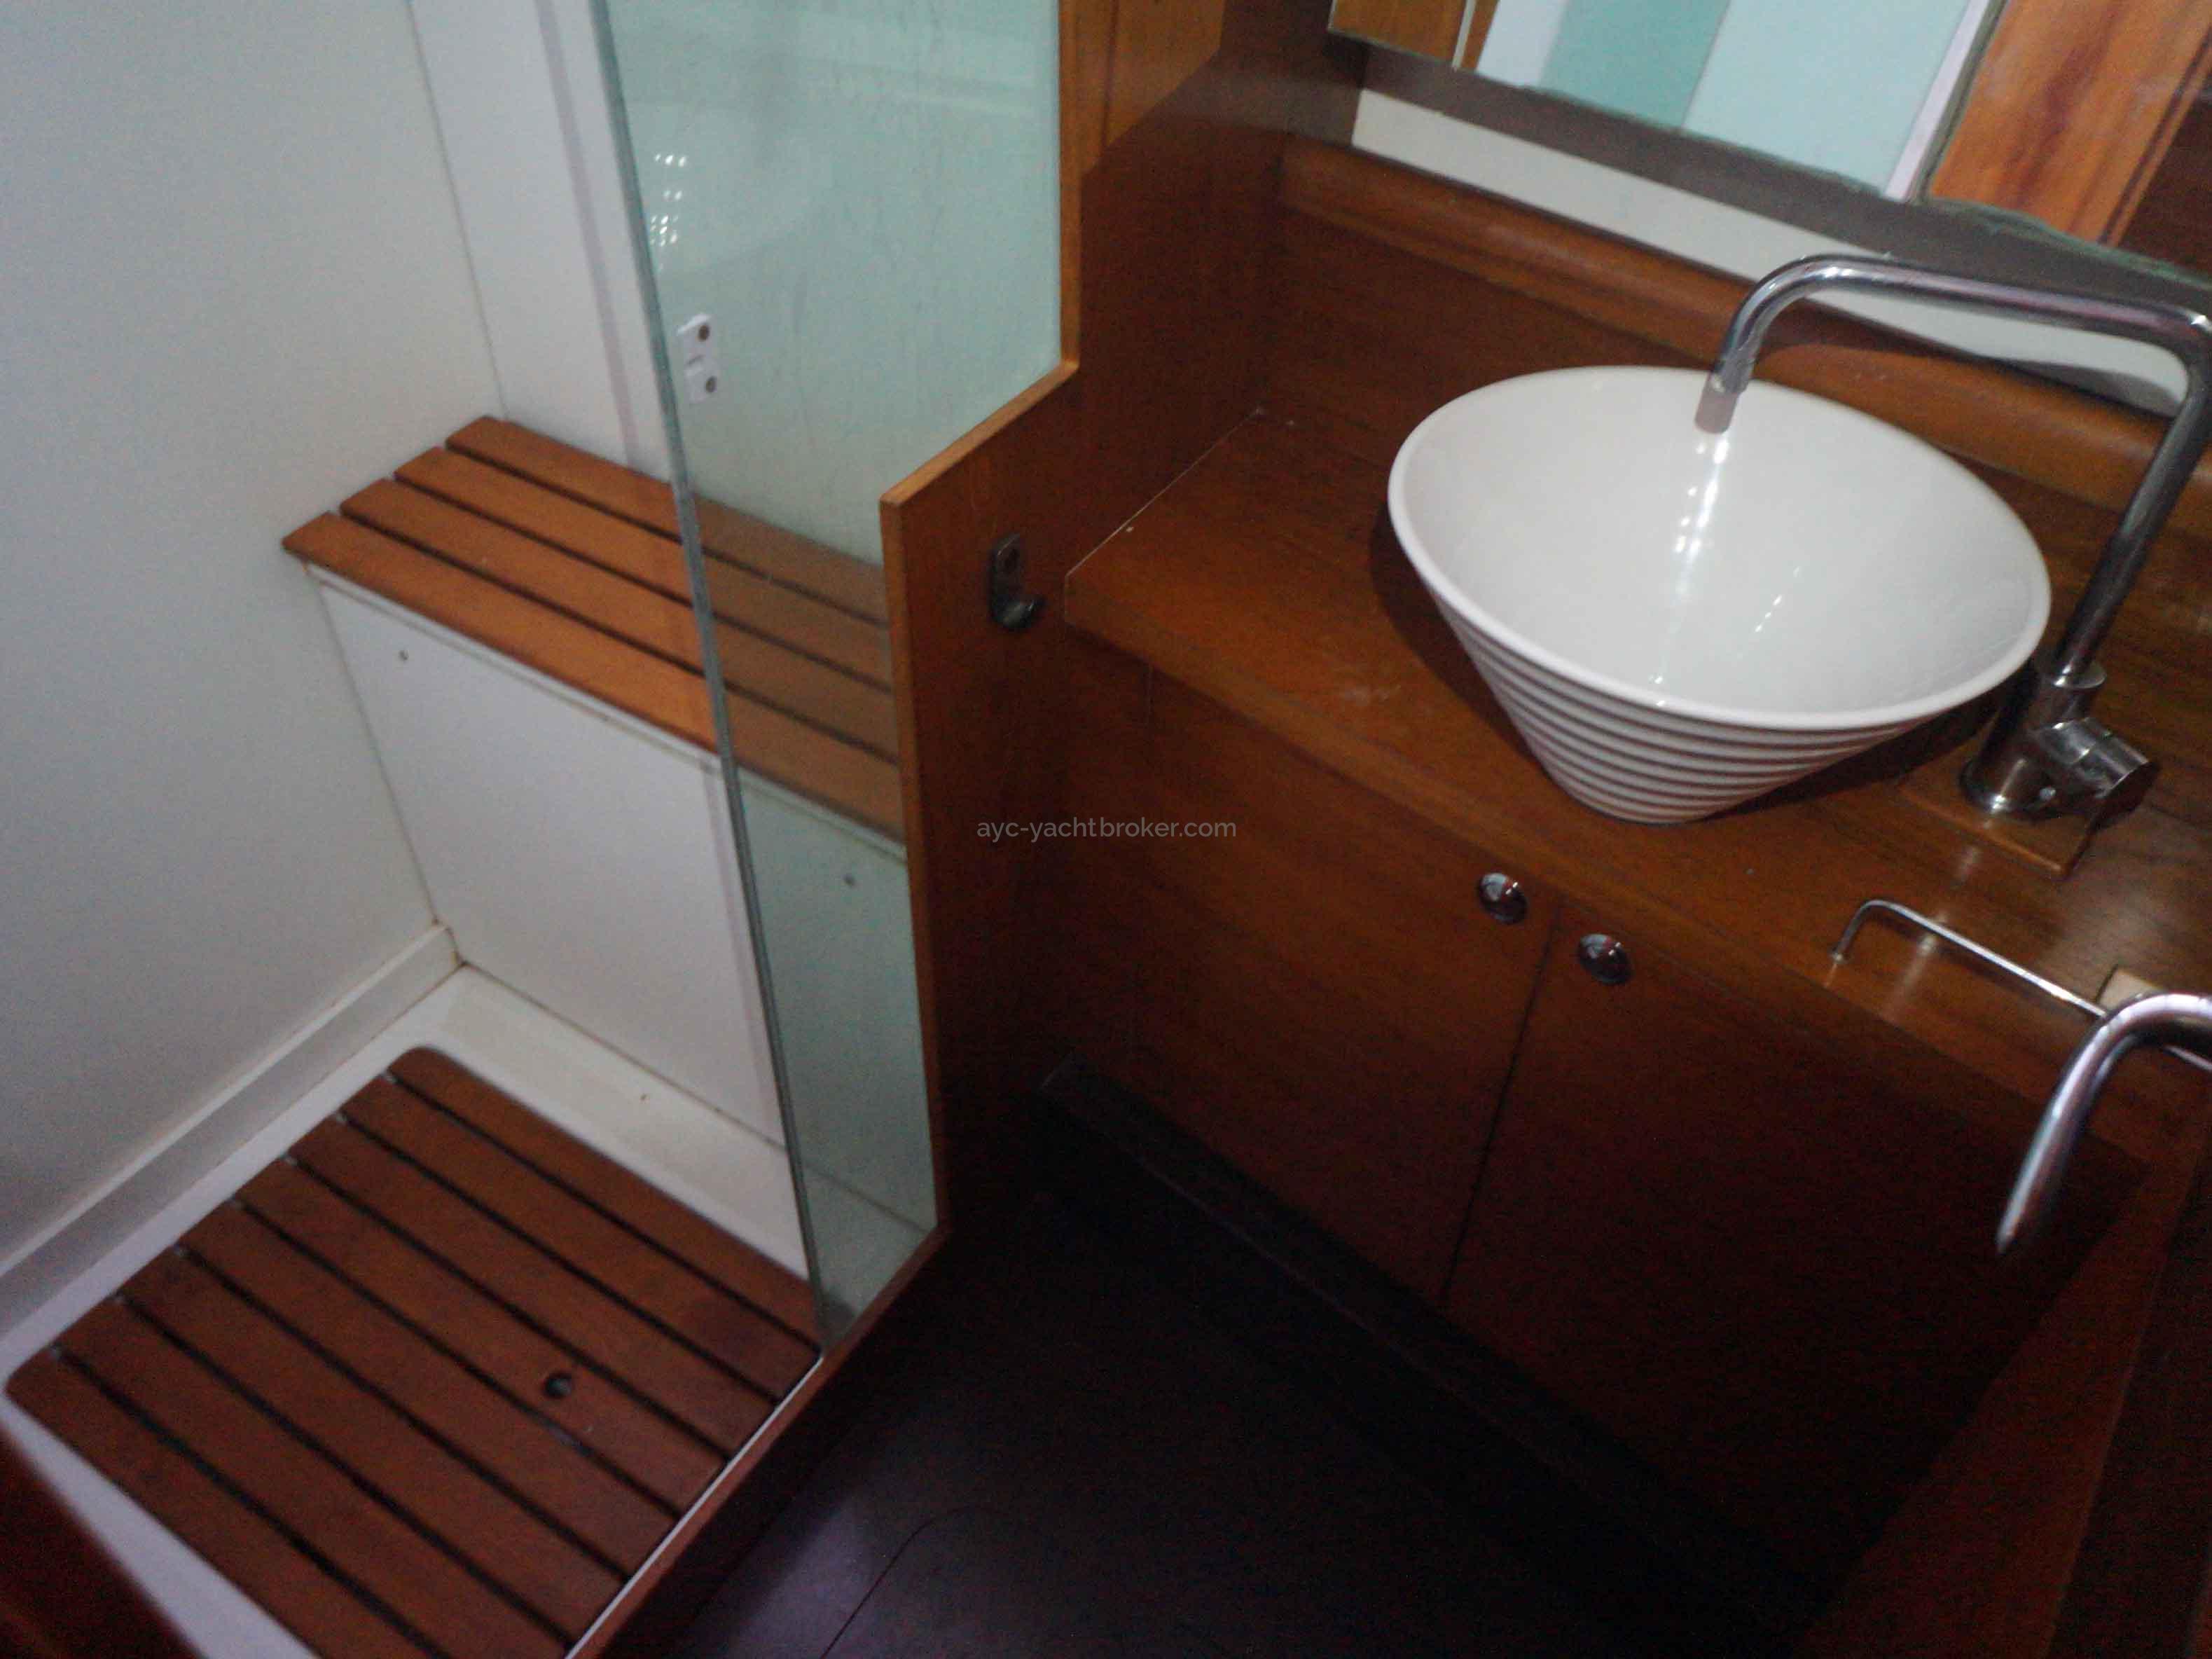 AYC International Yachtbroker - Pilot Saloon 55 -